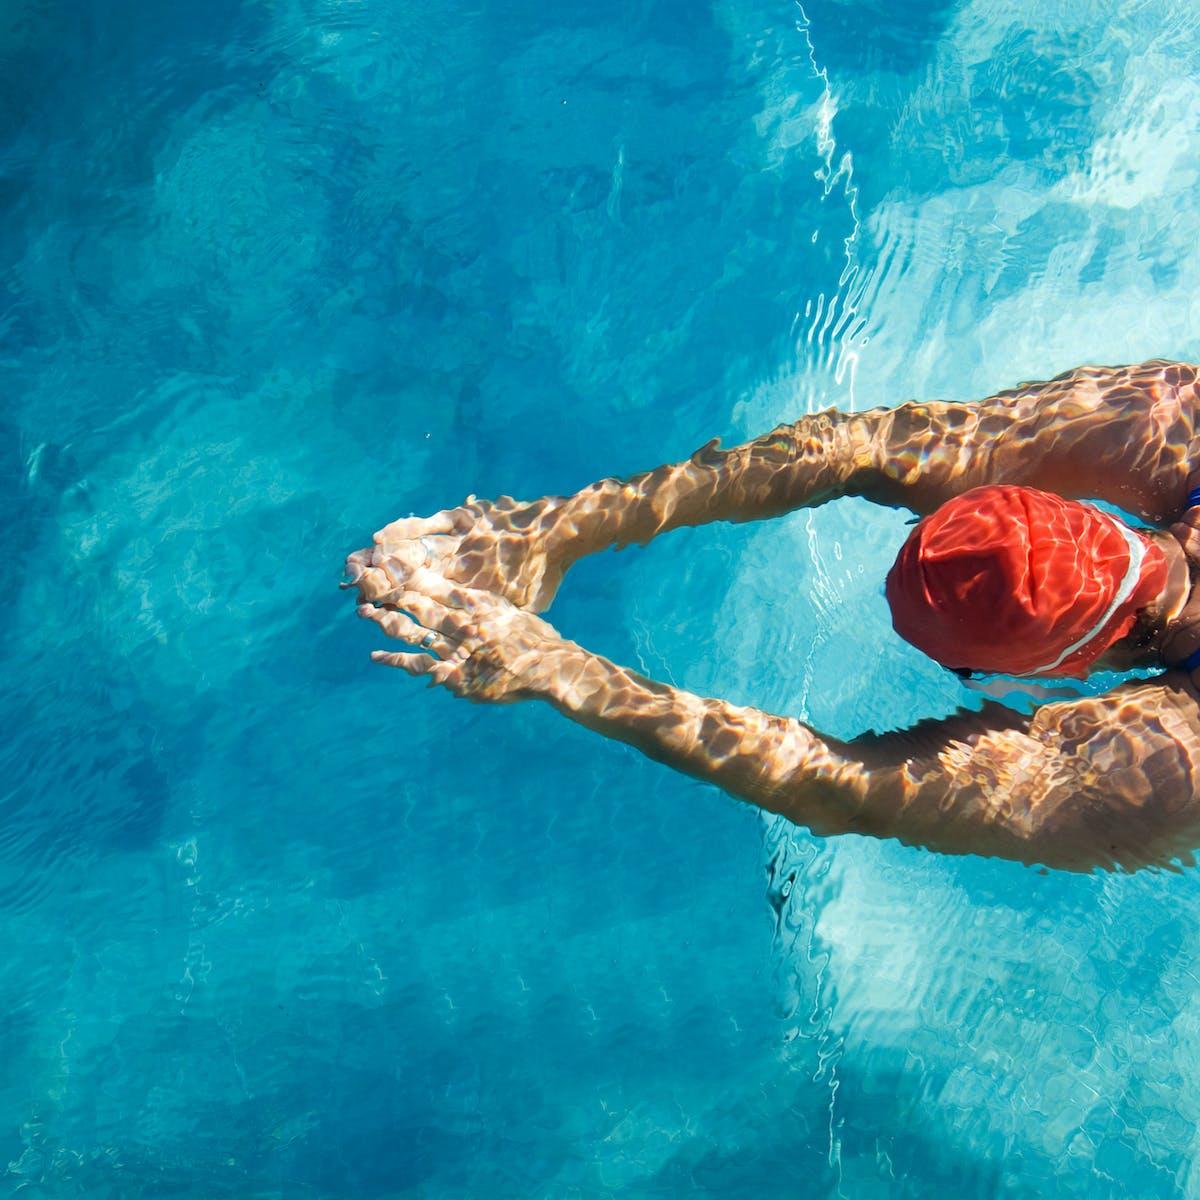 Drugs in sport: what constitutes 'unfair advantage'?